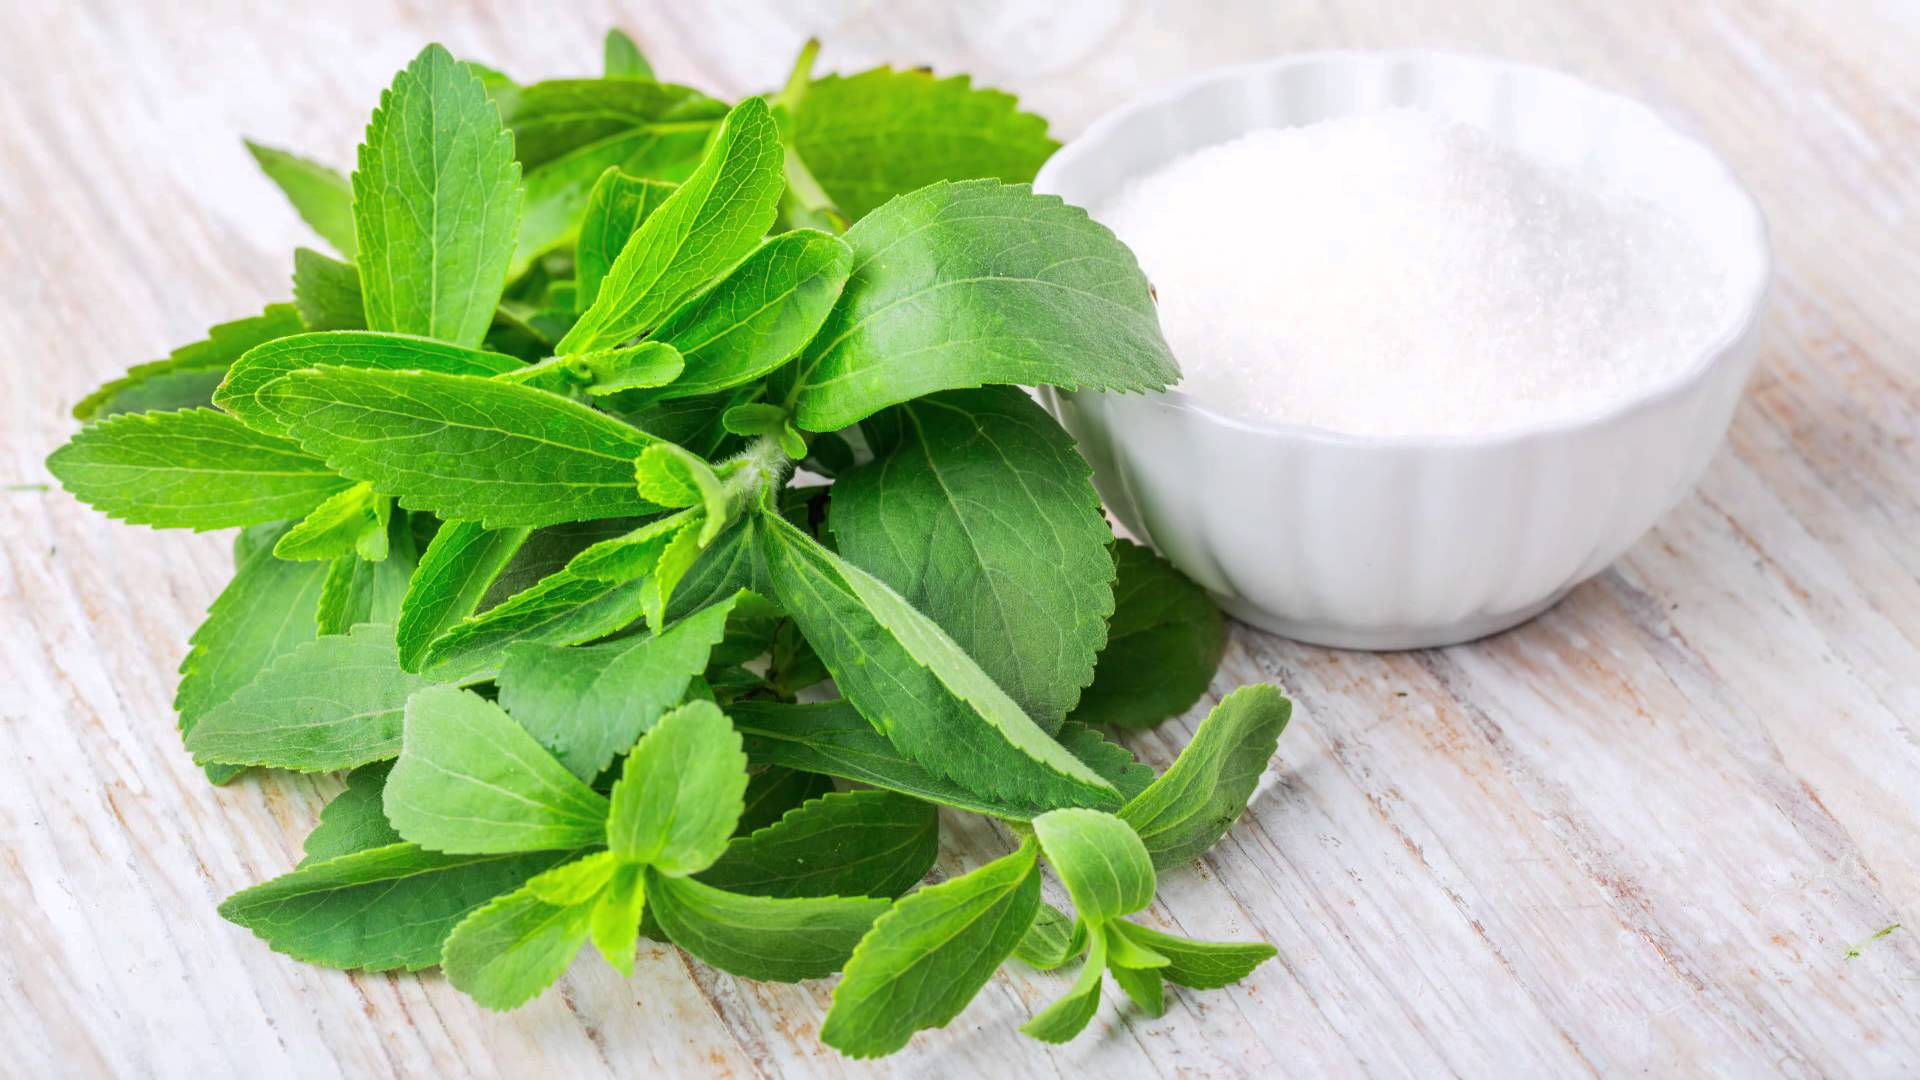 New Study says Stevia May Help Control Blood Sugar Levels